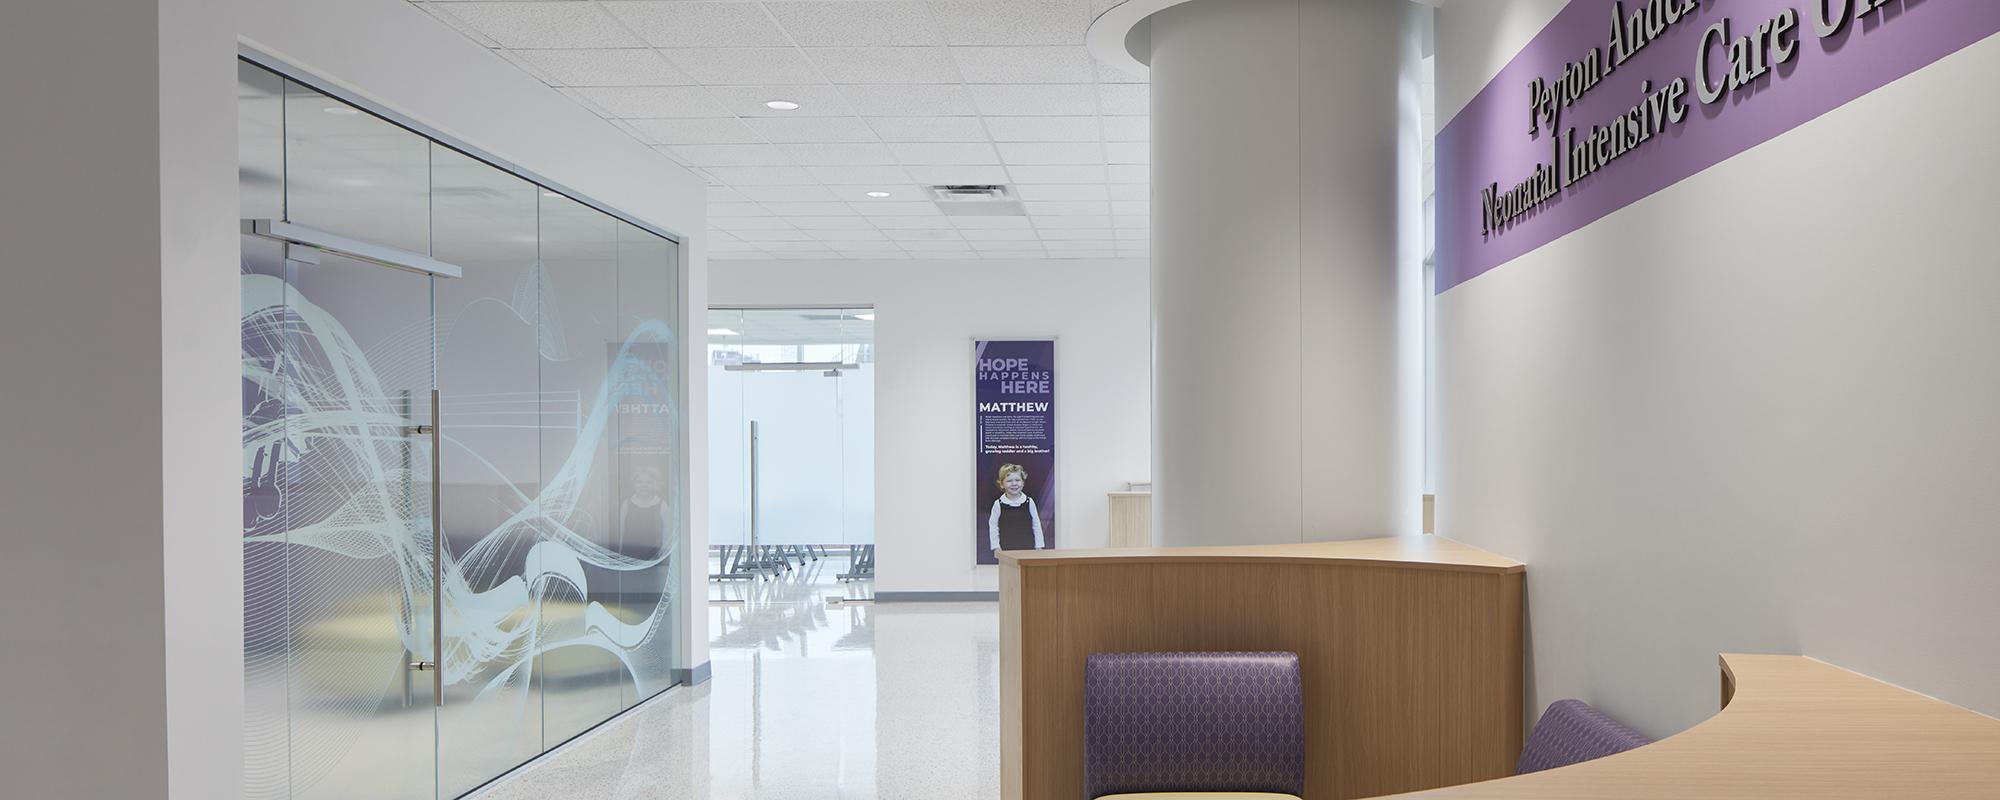 Intensive care unit entry